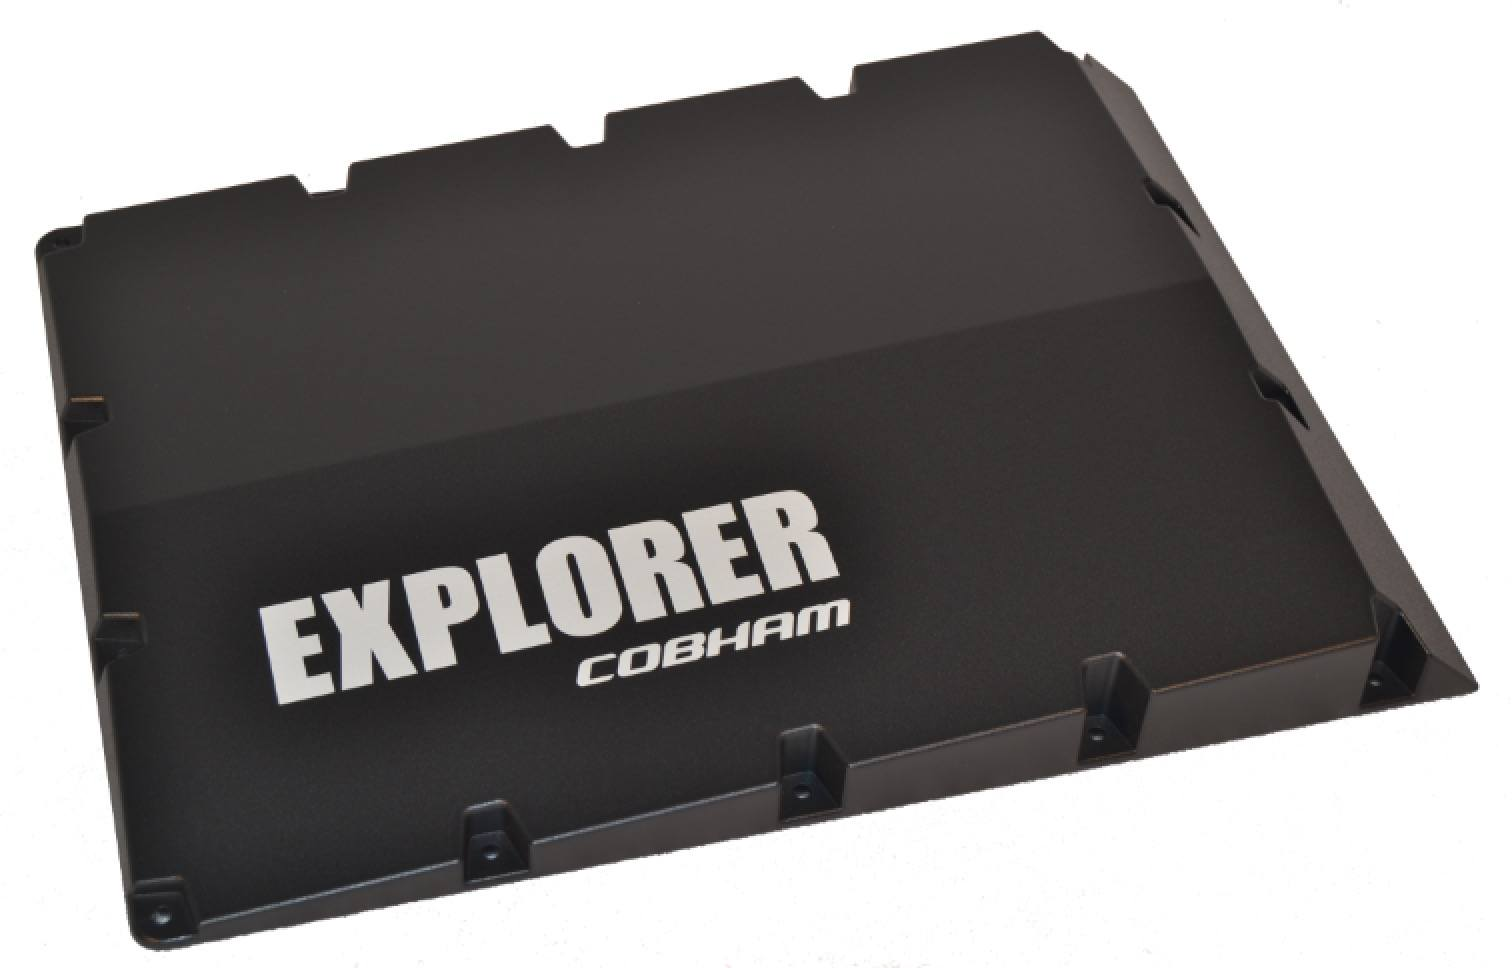 Serigrafitryk på aluminium explorer cobham